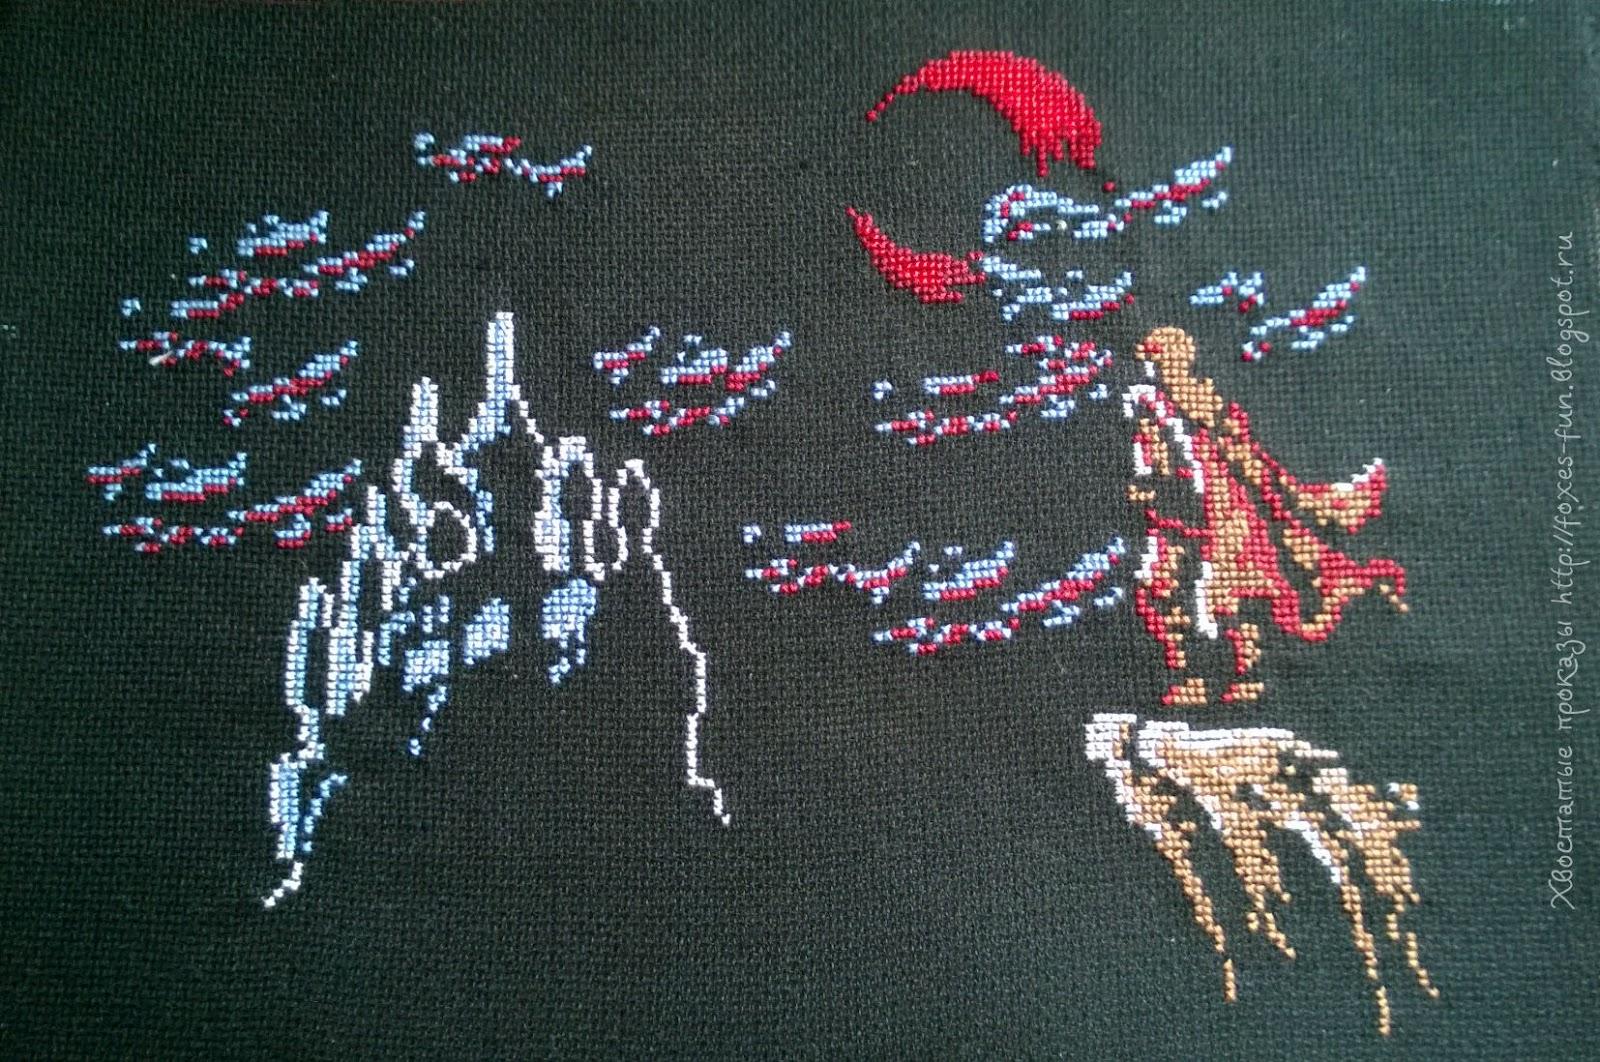 Castlevania вышивка, схема кастельвания, своими руками, cross stitch pattern